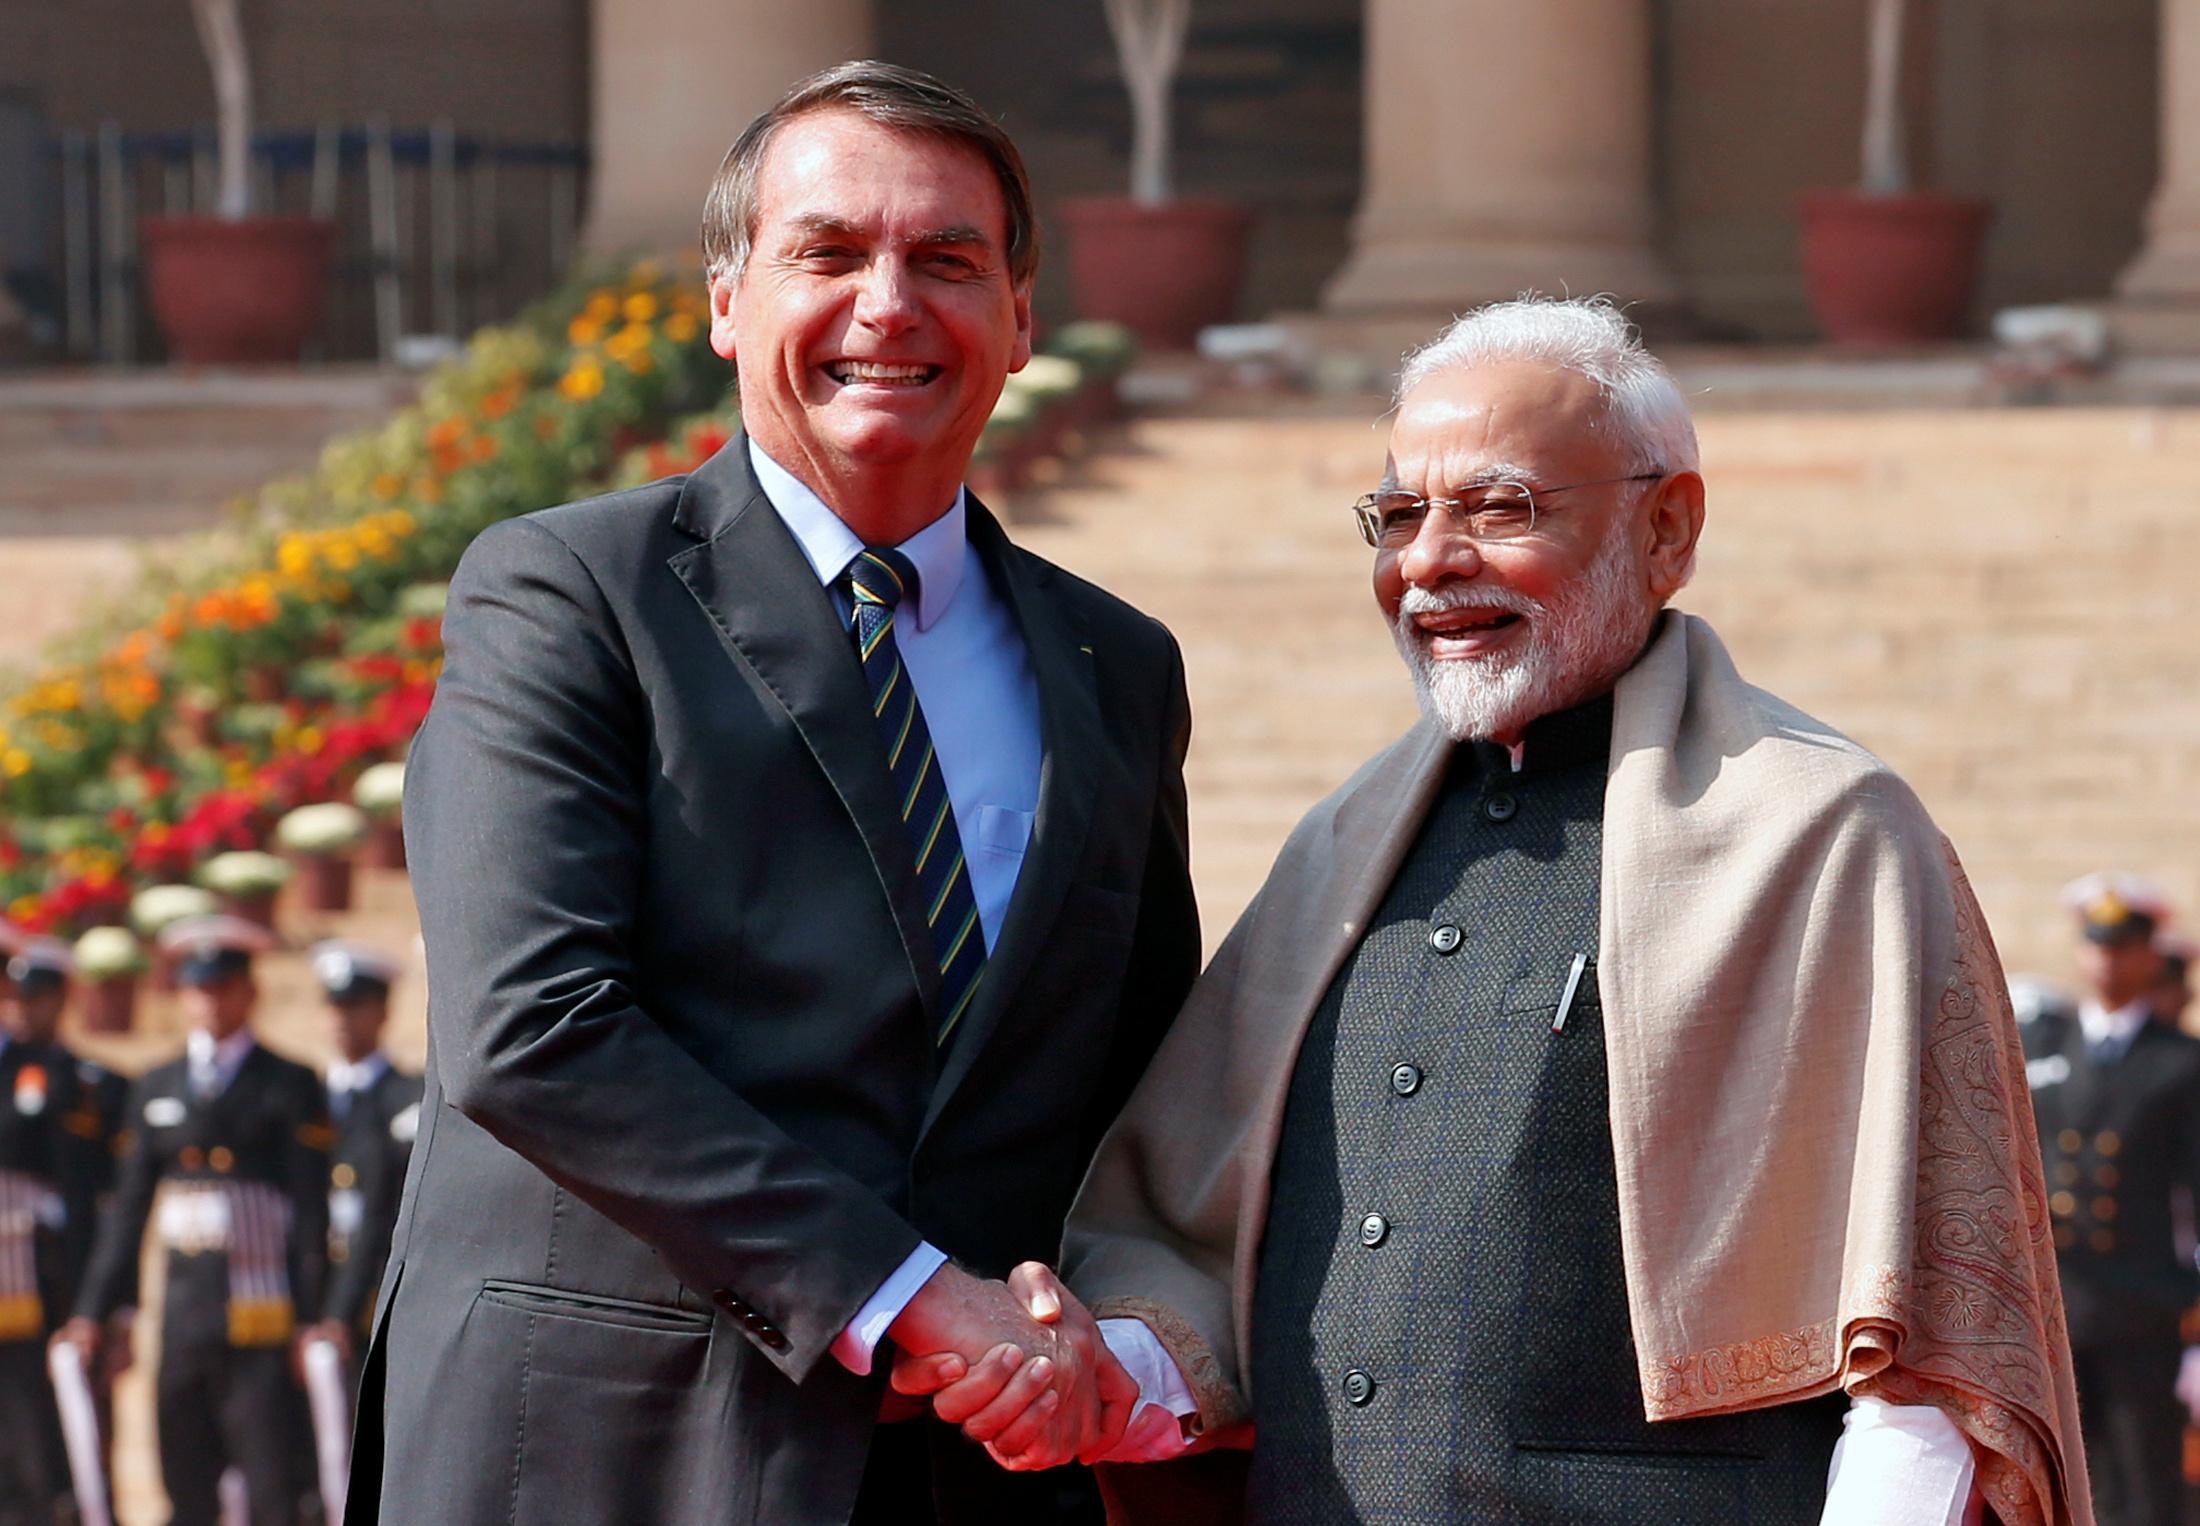 India, Brazil sign 15 accords to deepen ties across range of sectors